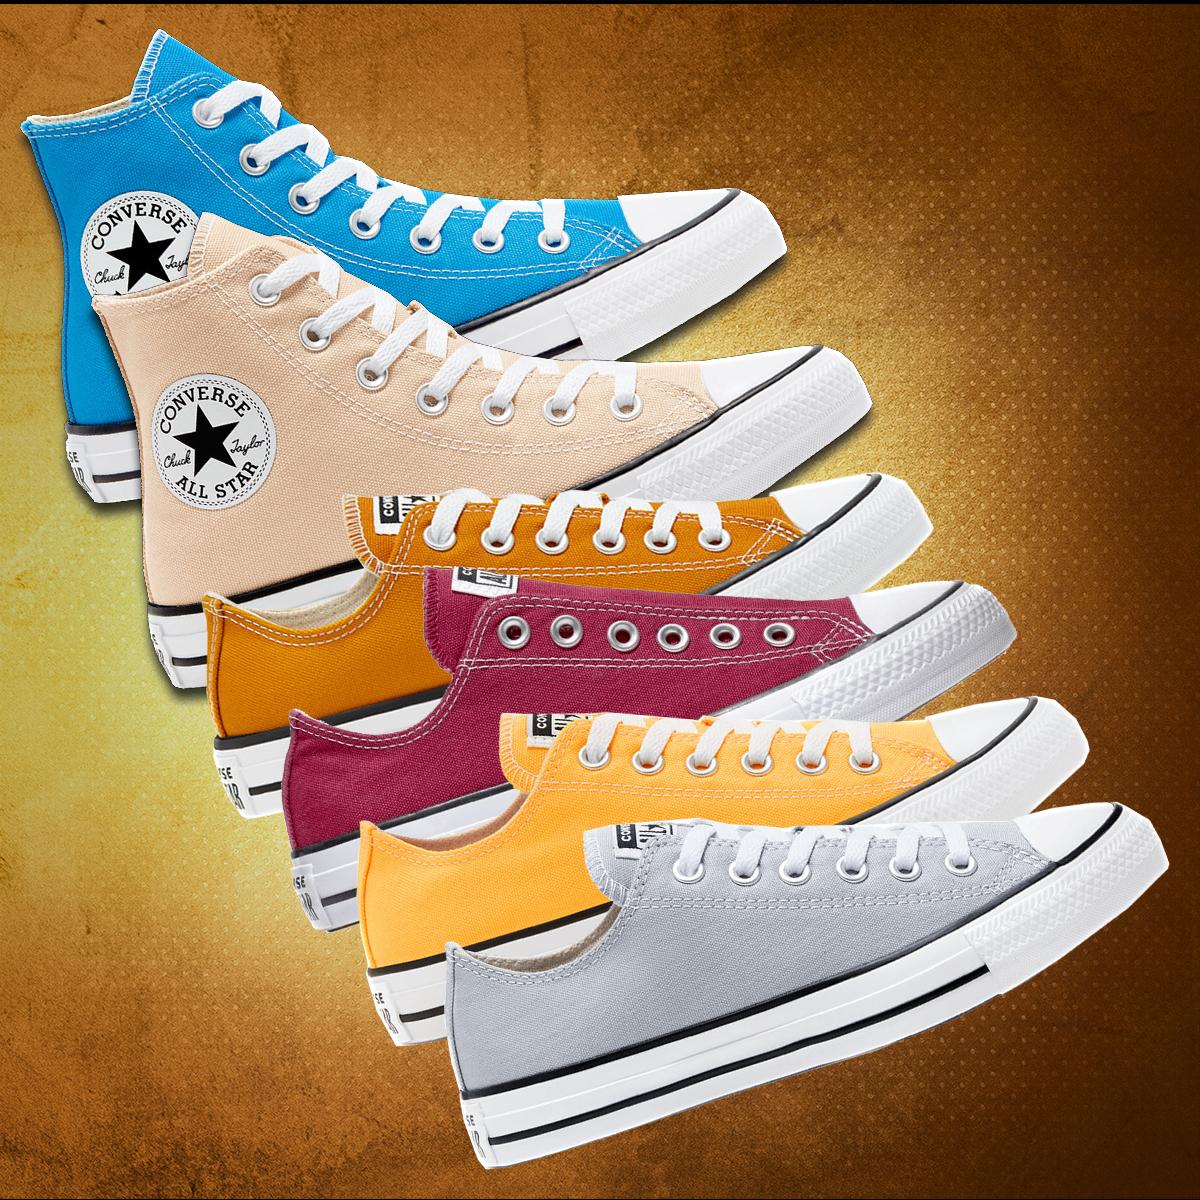 [Geomix] Converse Sneakers-Sale, zB.:Chuck Taylor All Star Slip On gelb oder rot (Größen 37 bis 46,5)